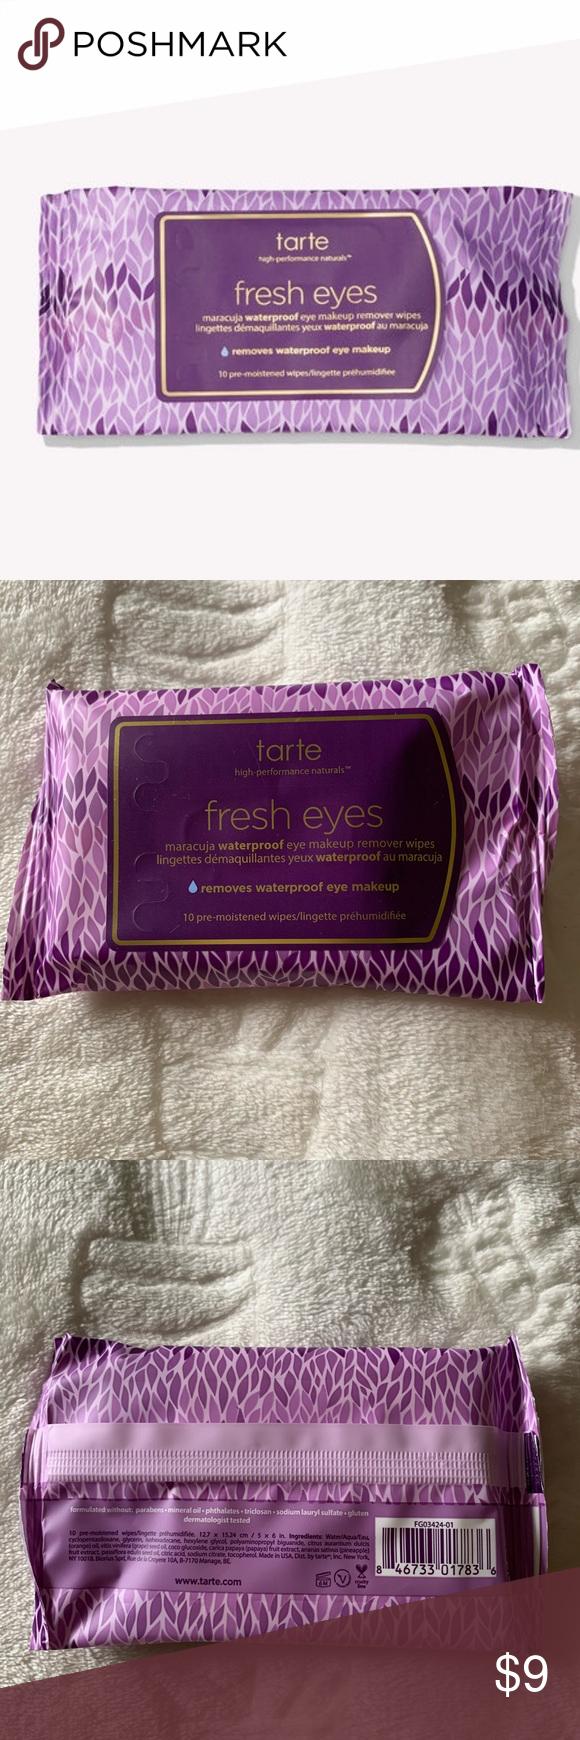 ⭐️3/15 Tarte Fresh Eyes Makeup Wipes NWT Makeup wipes